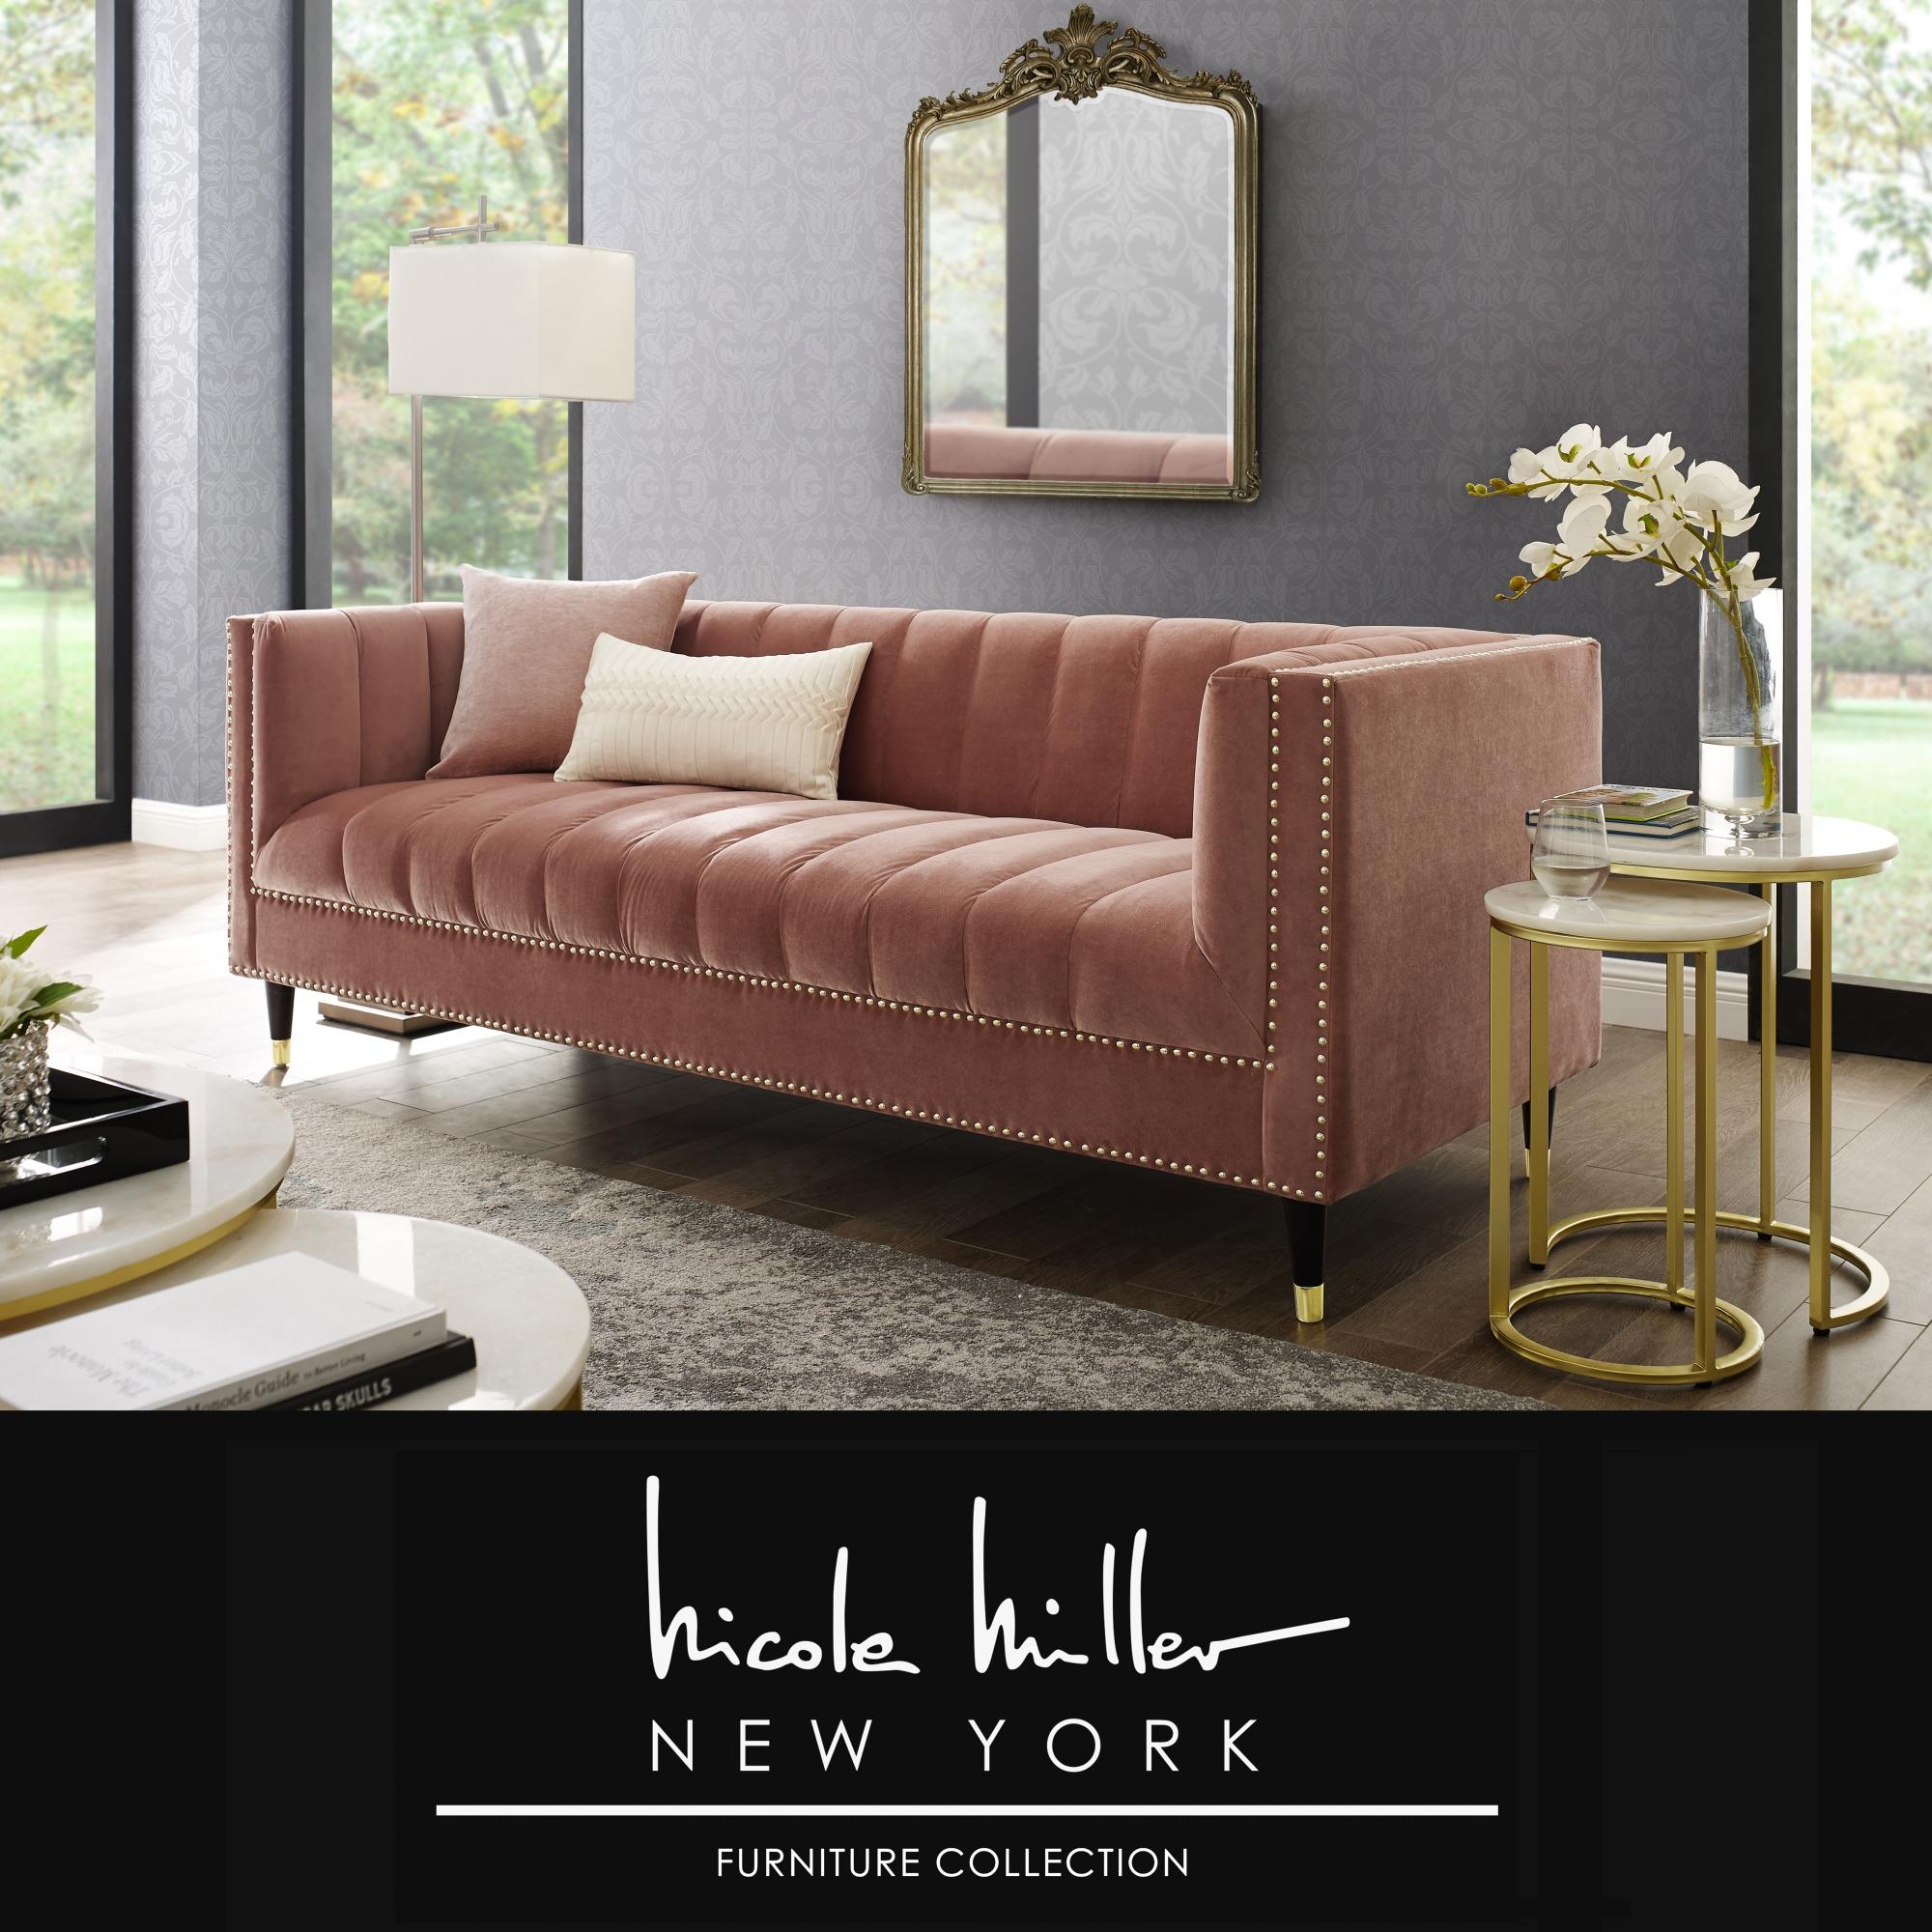 Nicole Miller Blush/Gold Velvet Sofa Line Stitch Tufted Gold Nailhead Trim and Tapered Gold Leg Tip